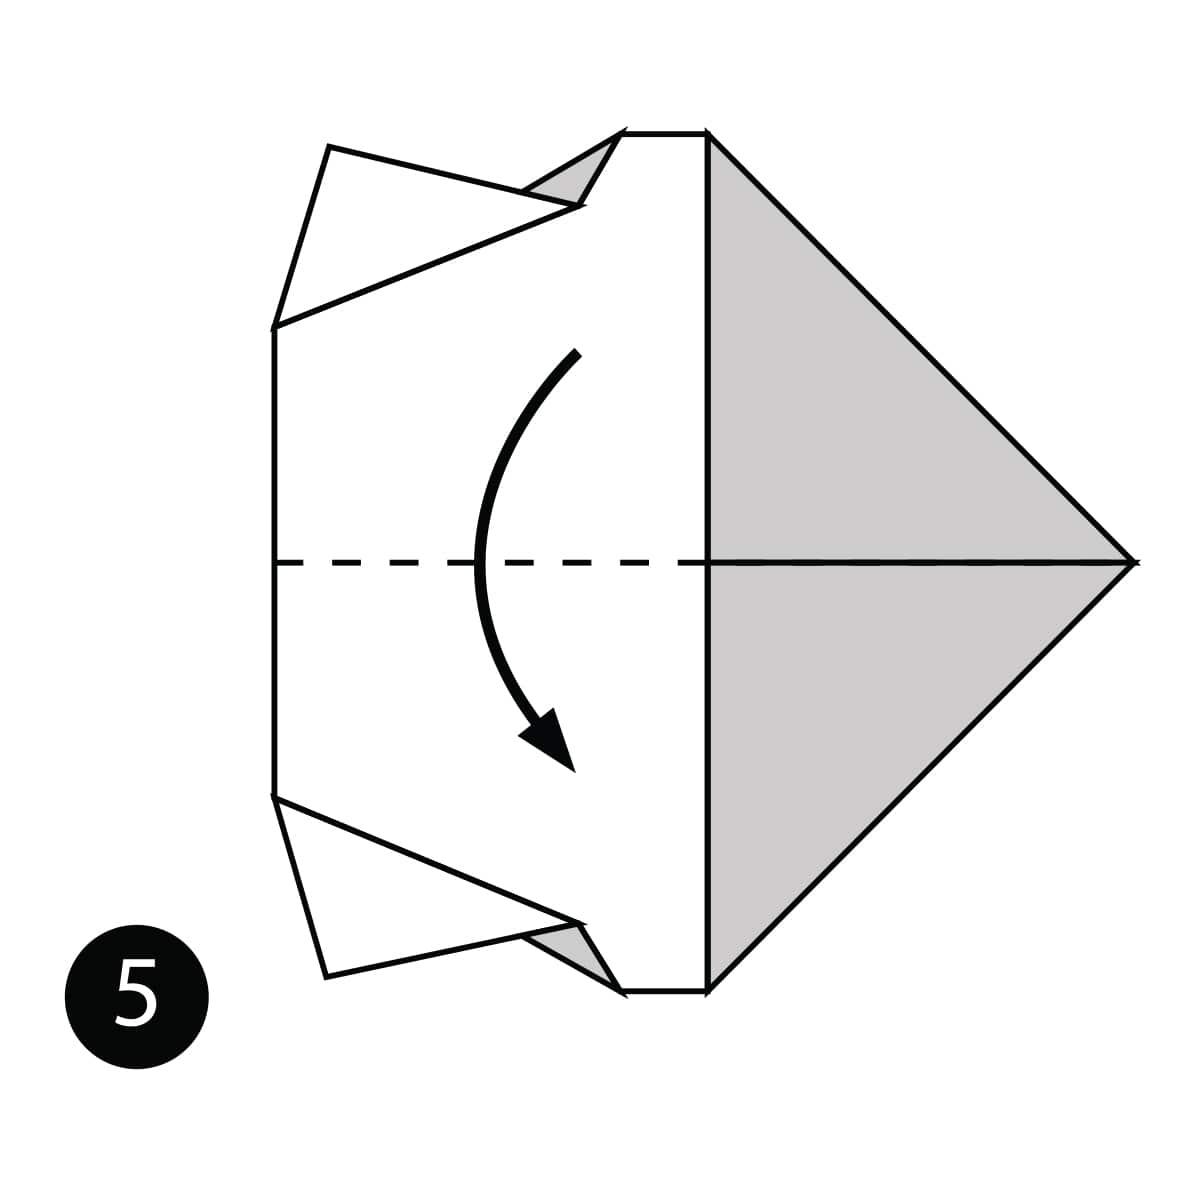 Rhino Step 5